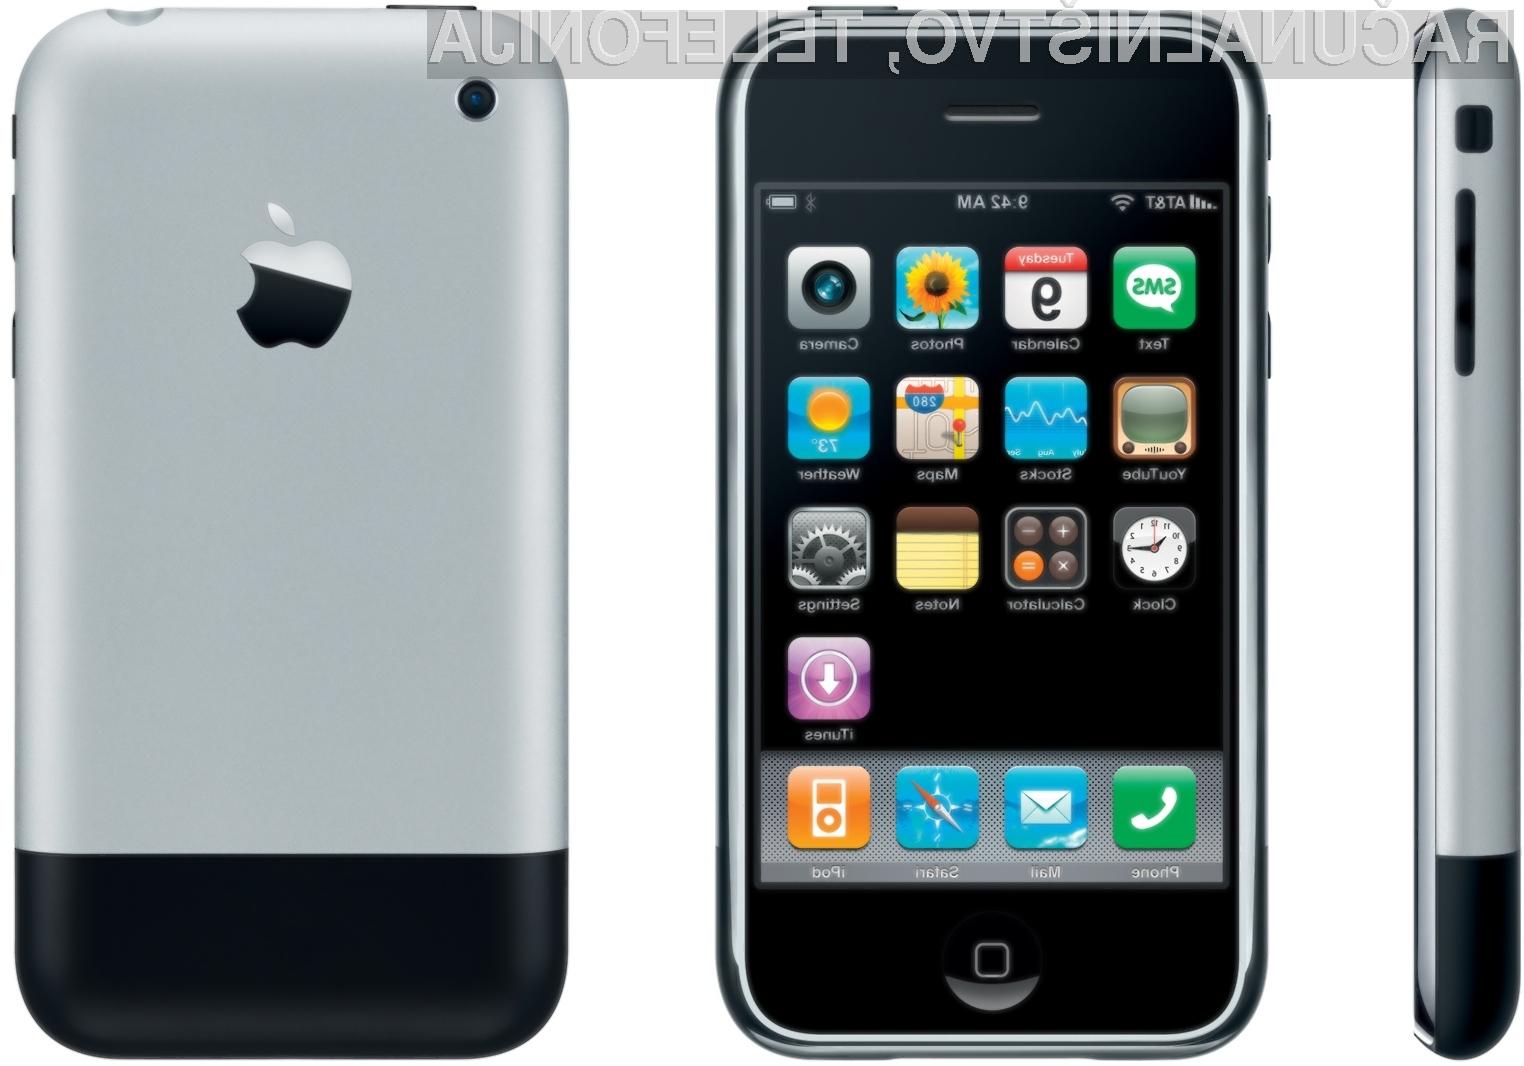 iPhone – predhodnik današnjih pametnih telefonov.